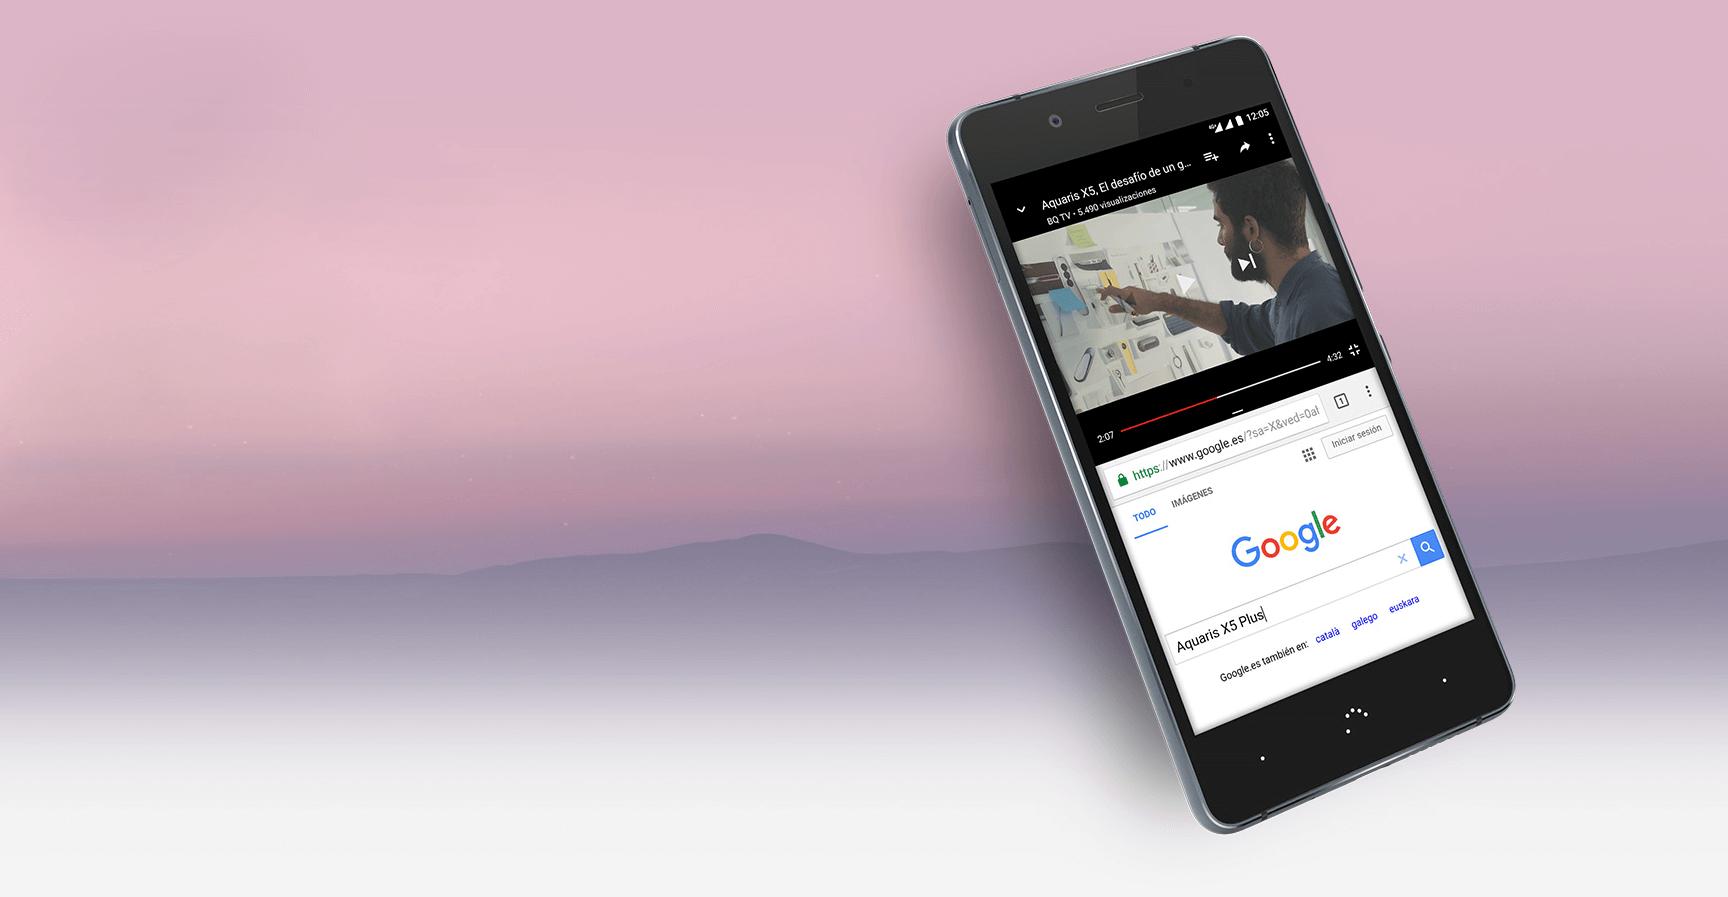 Actualización BQ Aquaris X5 Plus a Android 7.1 Nougat ya disponible